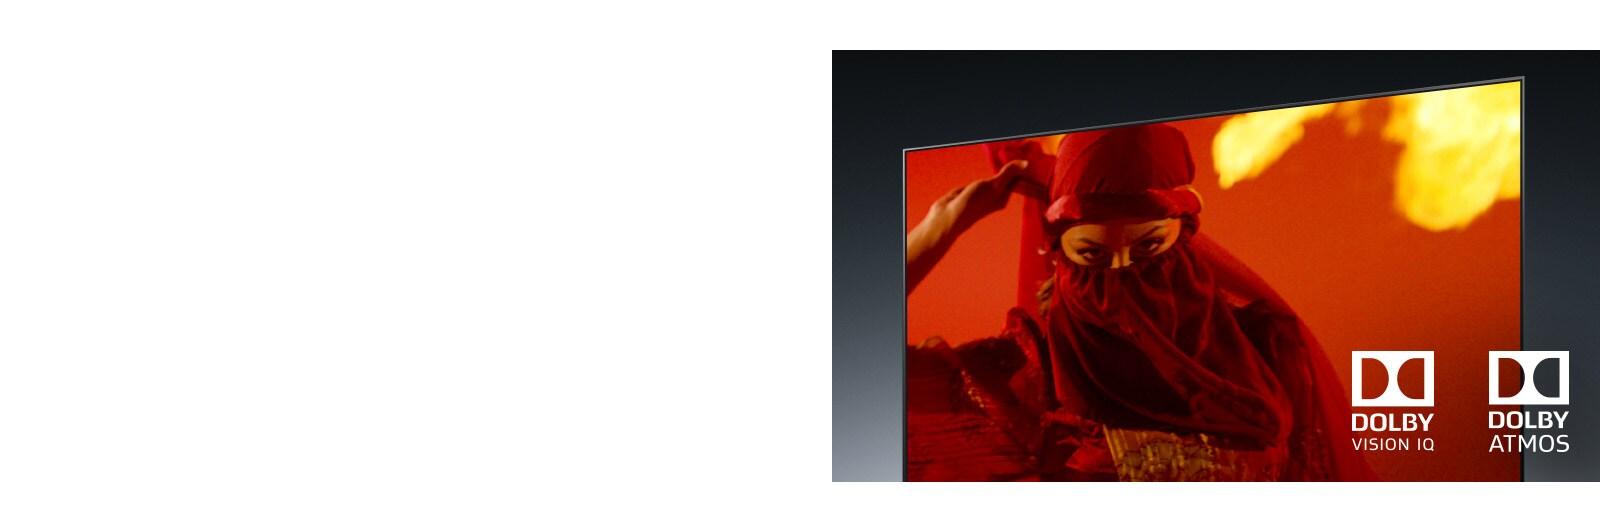 LG 65NANO86TNA Dolby Vision IQ and Atmos